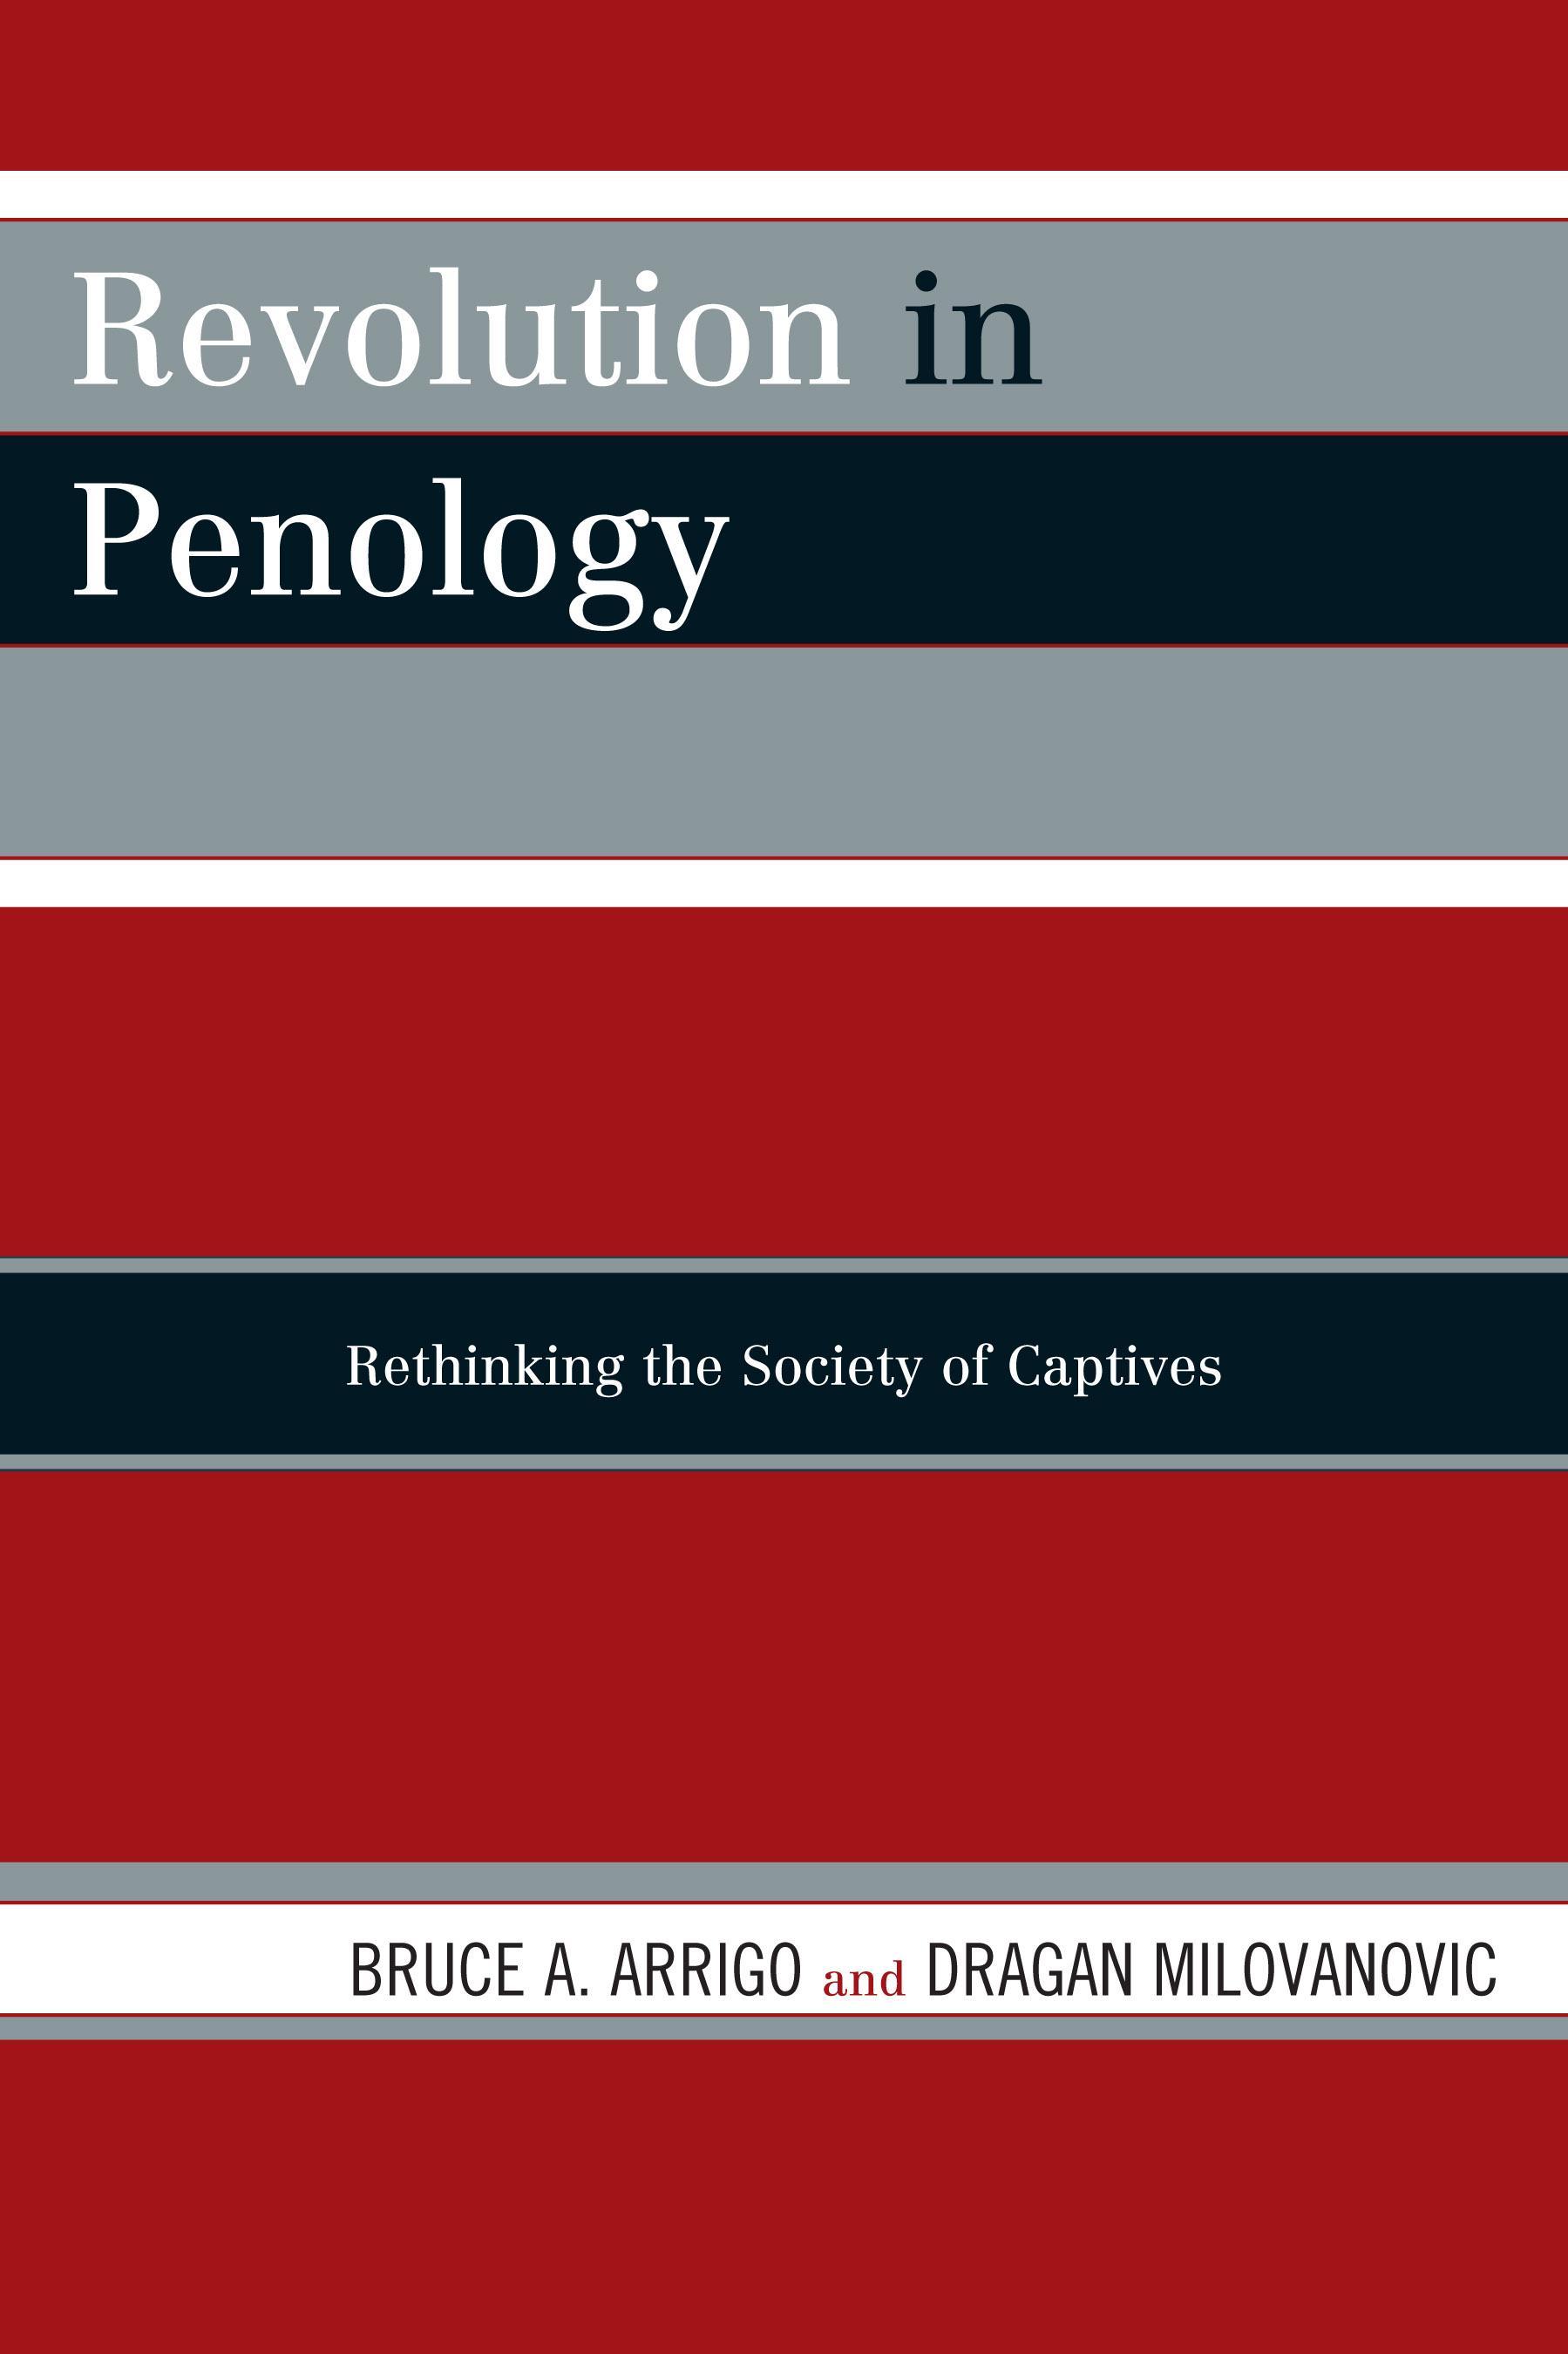 Revolution in Penology: Rethinking the Society of Captives EB9780742565678